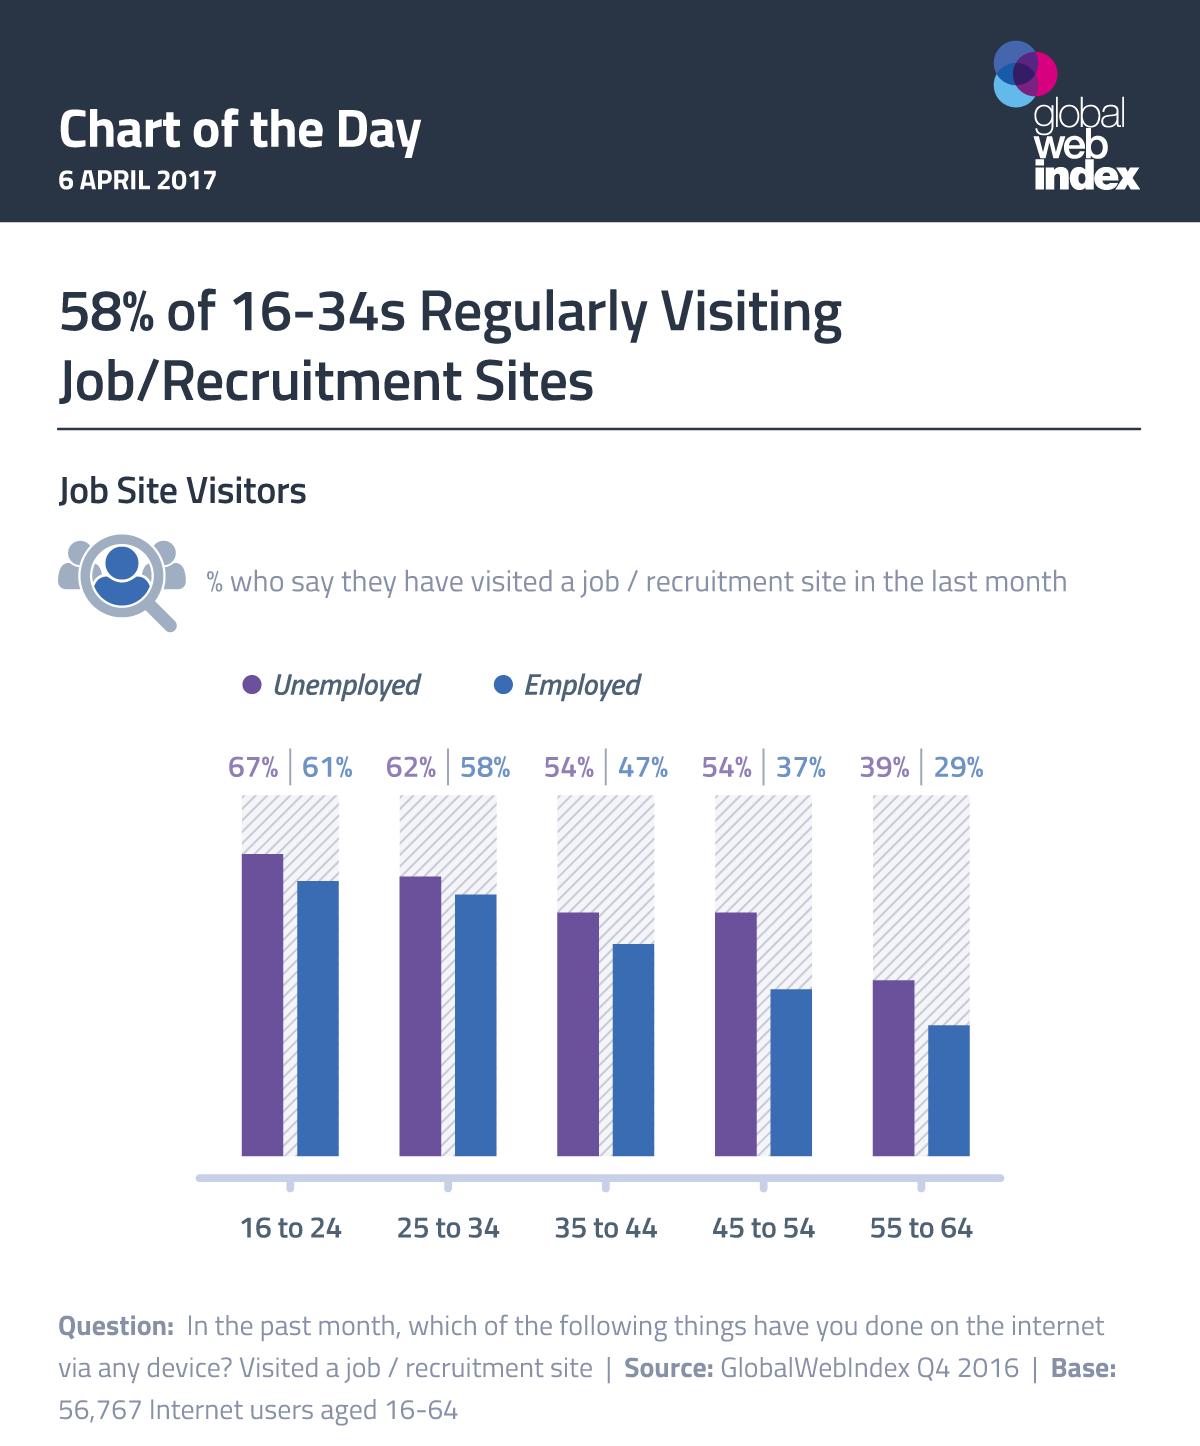 58% of 16-34s Regularly Visiting Job/Recruitment Sites